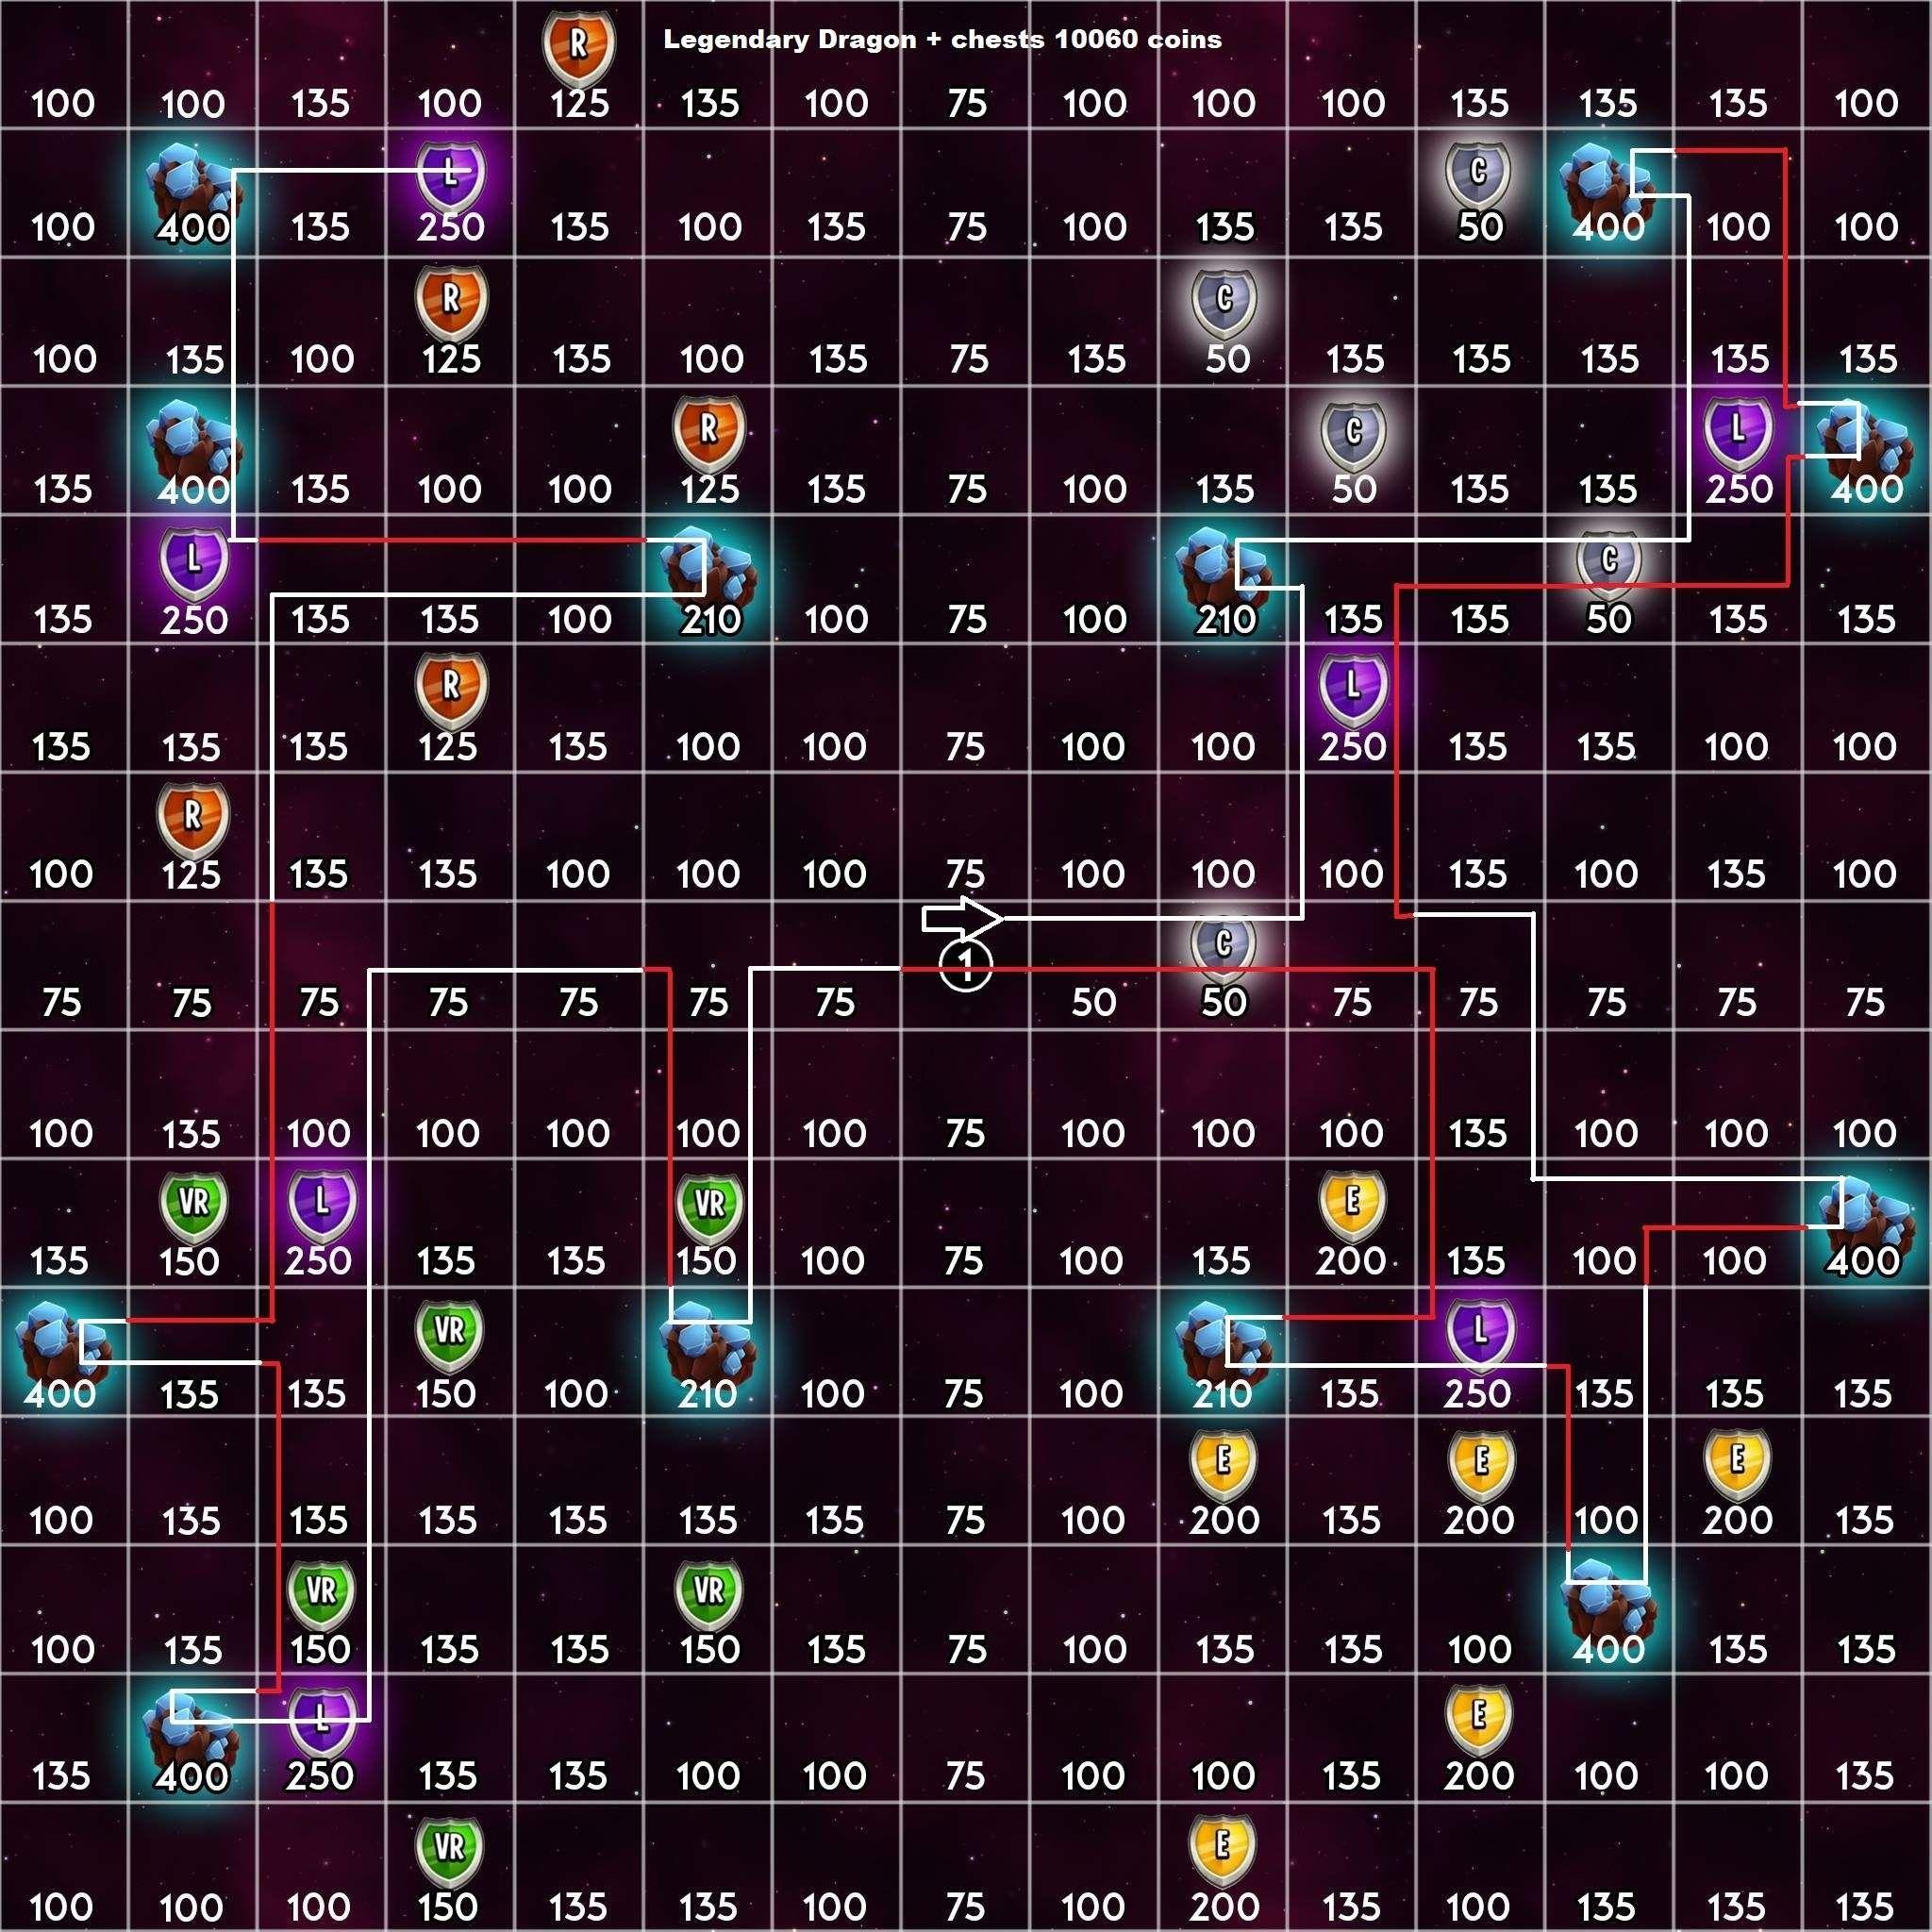 0_1623011356674_L+chests.jpg